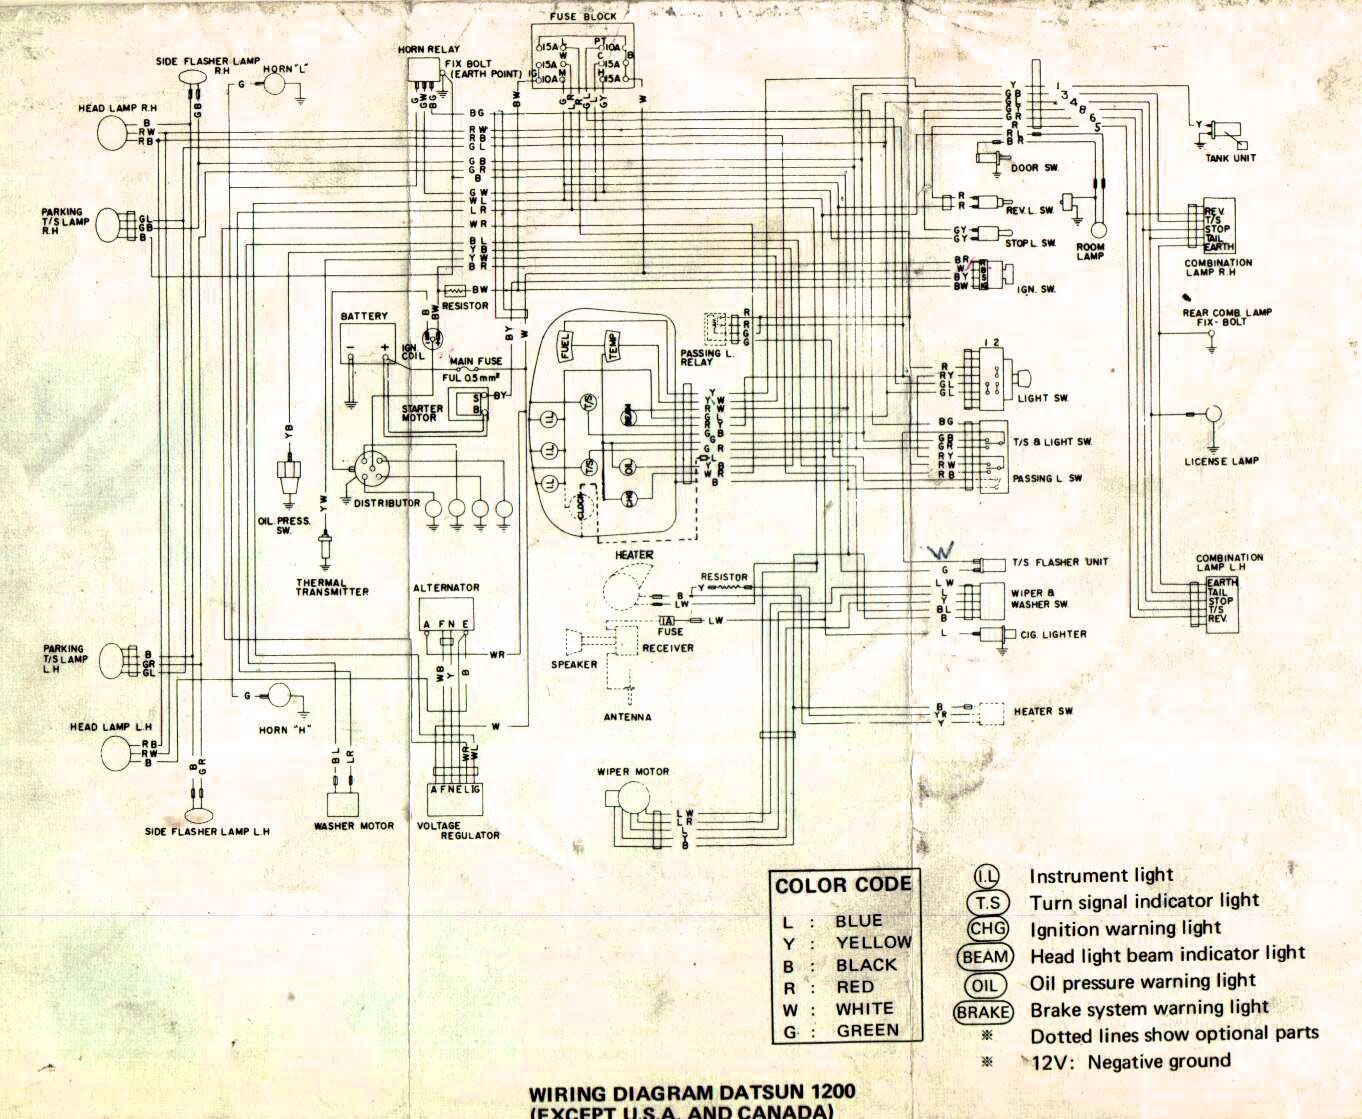 medium resolution of nissan 1400 wiring diagram wiring diagram dat nissan 1400 coil wiring diagram nissan 1400 wiring diagram